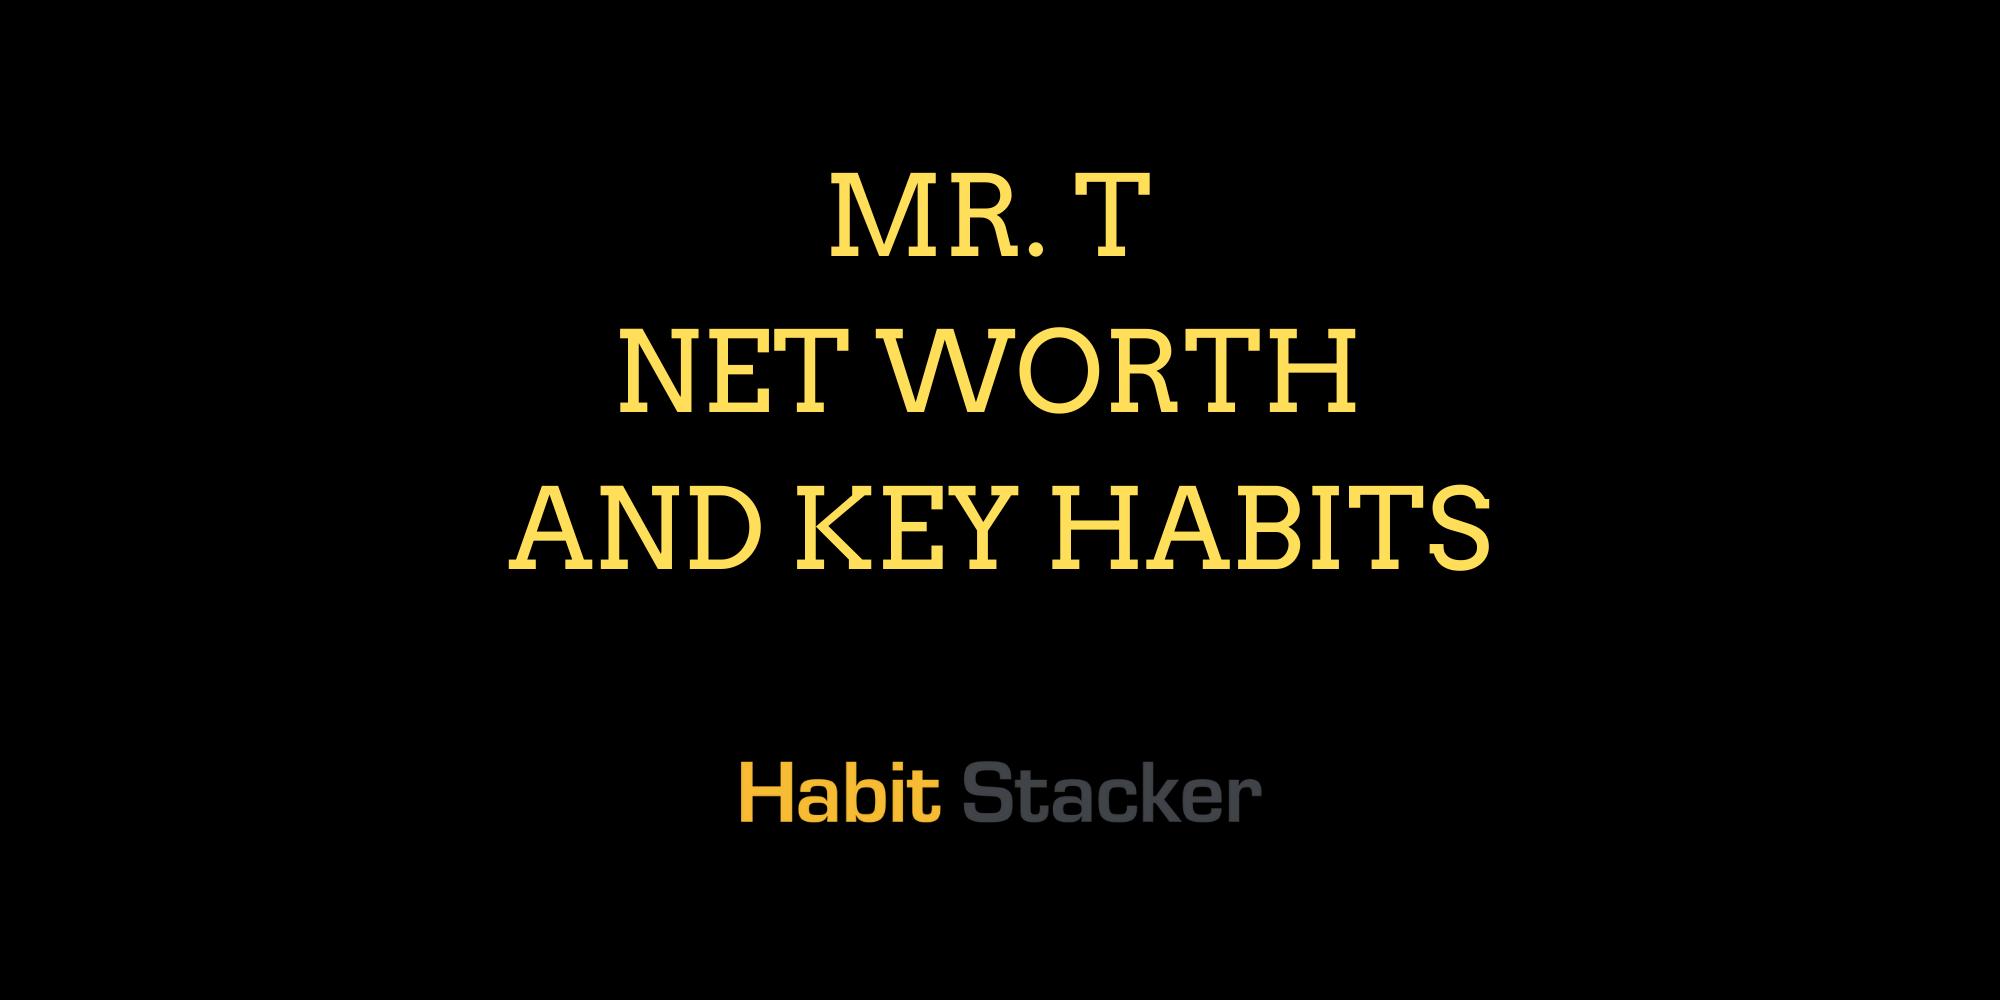 Mr. T Net Worth and Key Habits